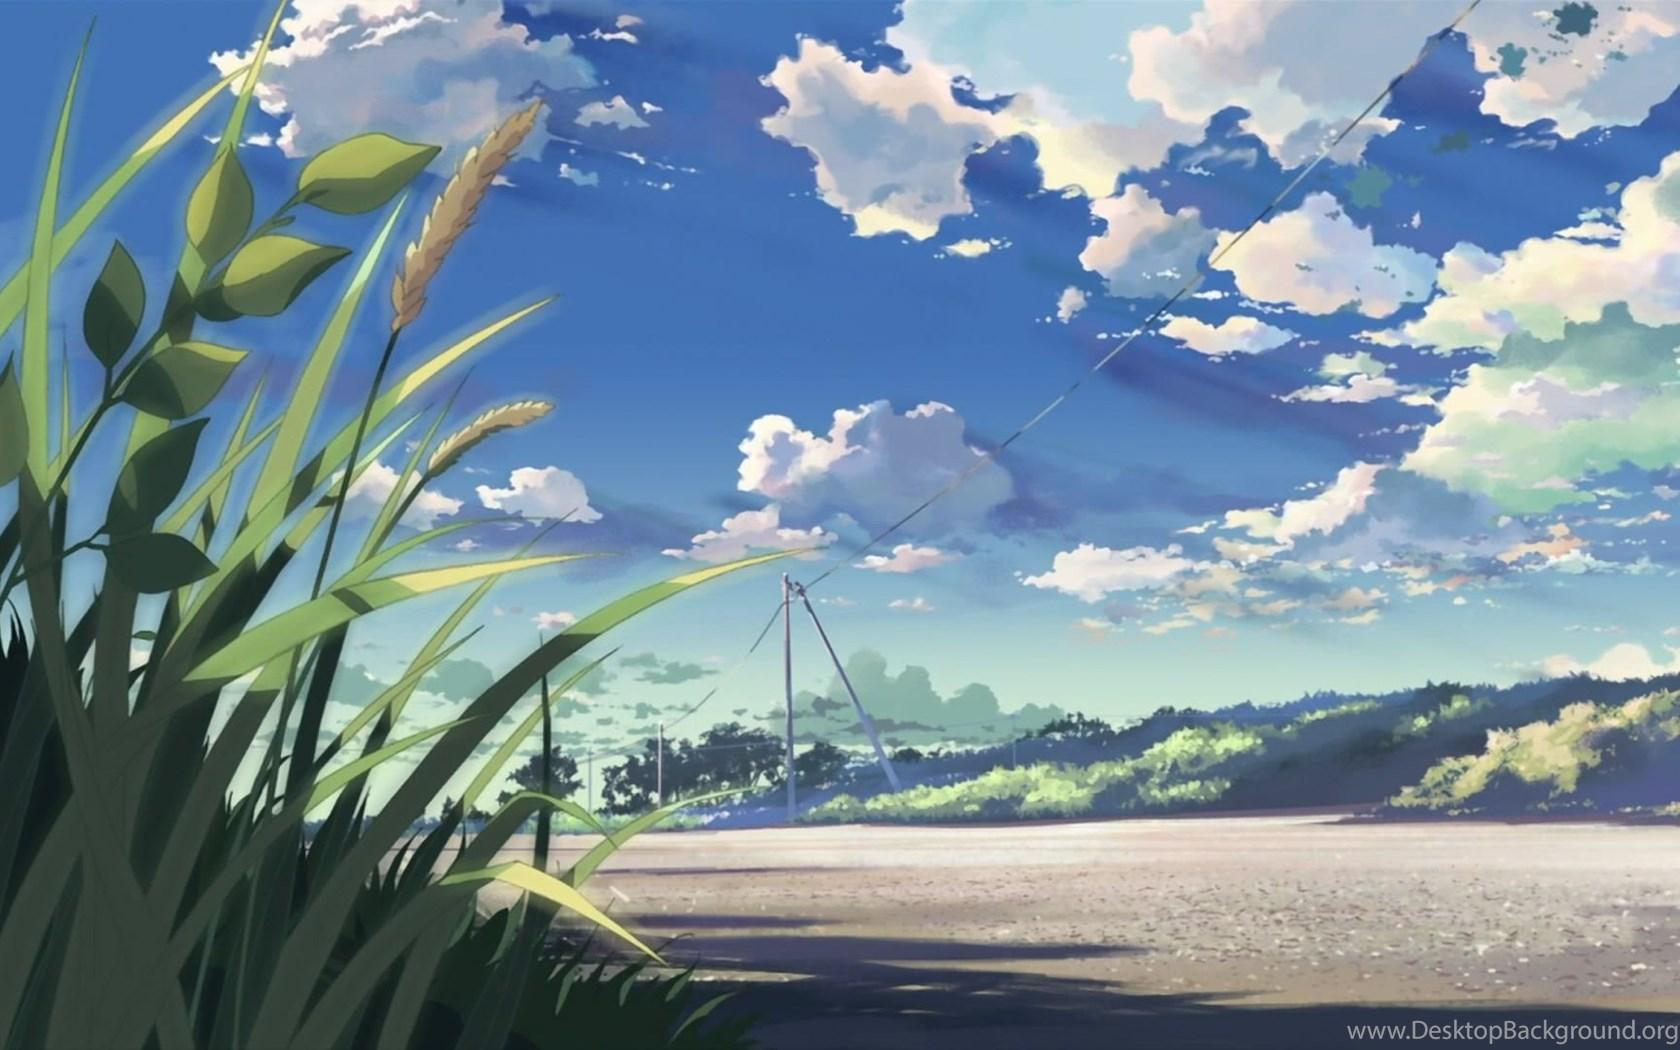 Windows bacgrounds image desktop background anime wallpaper. 41+ Aesthetic Anime Wallpapers HD | News Share